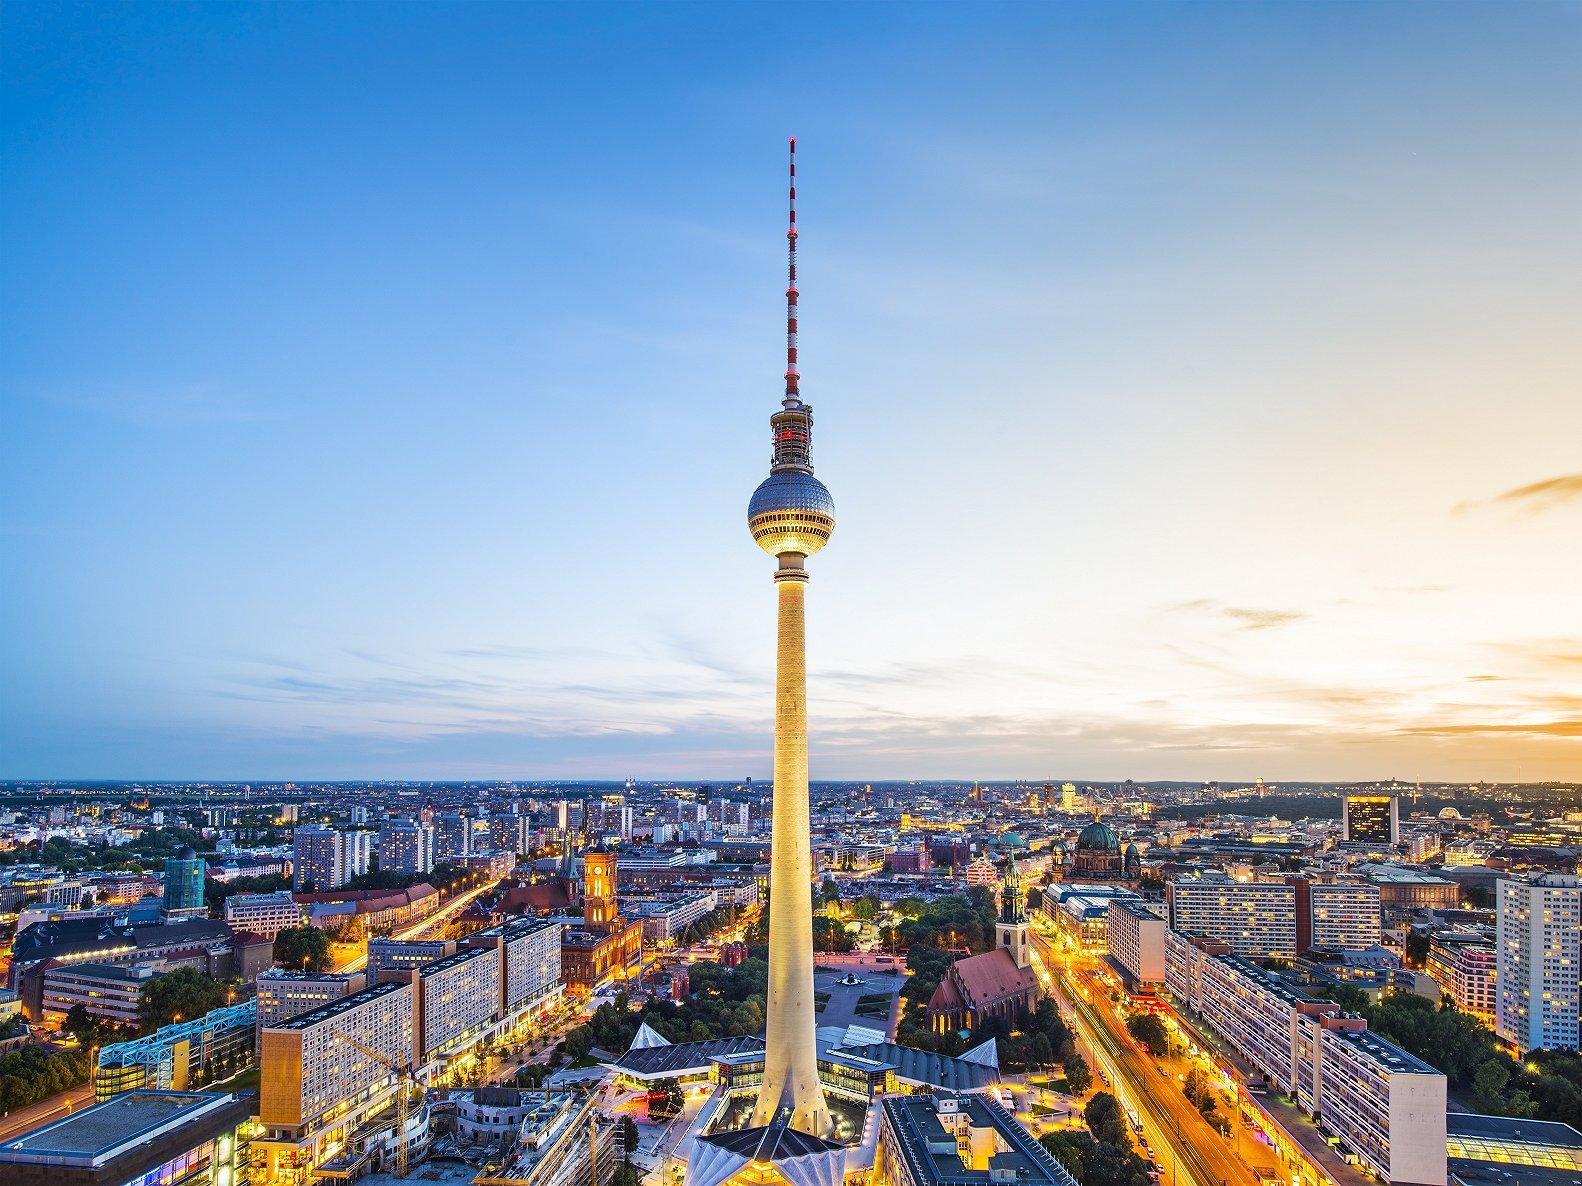 柏林电视塔  Berliner Fernsehturm   -0